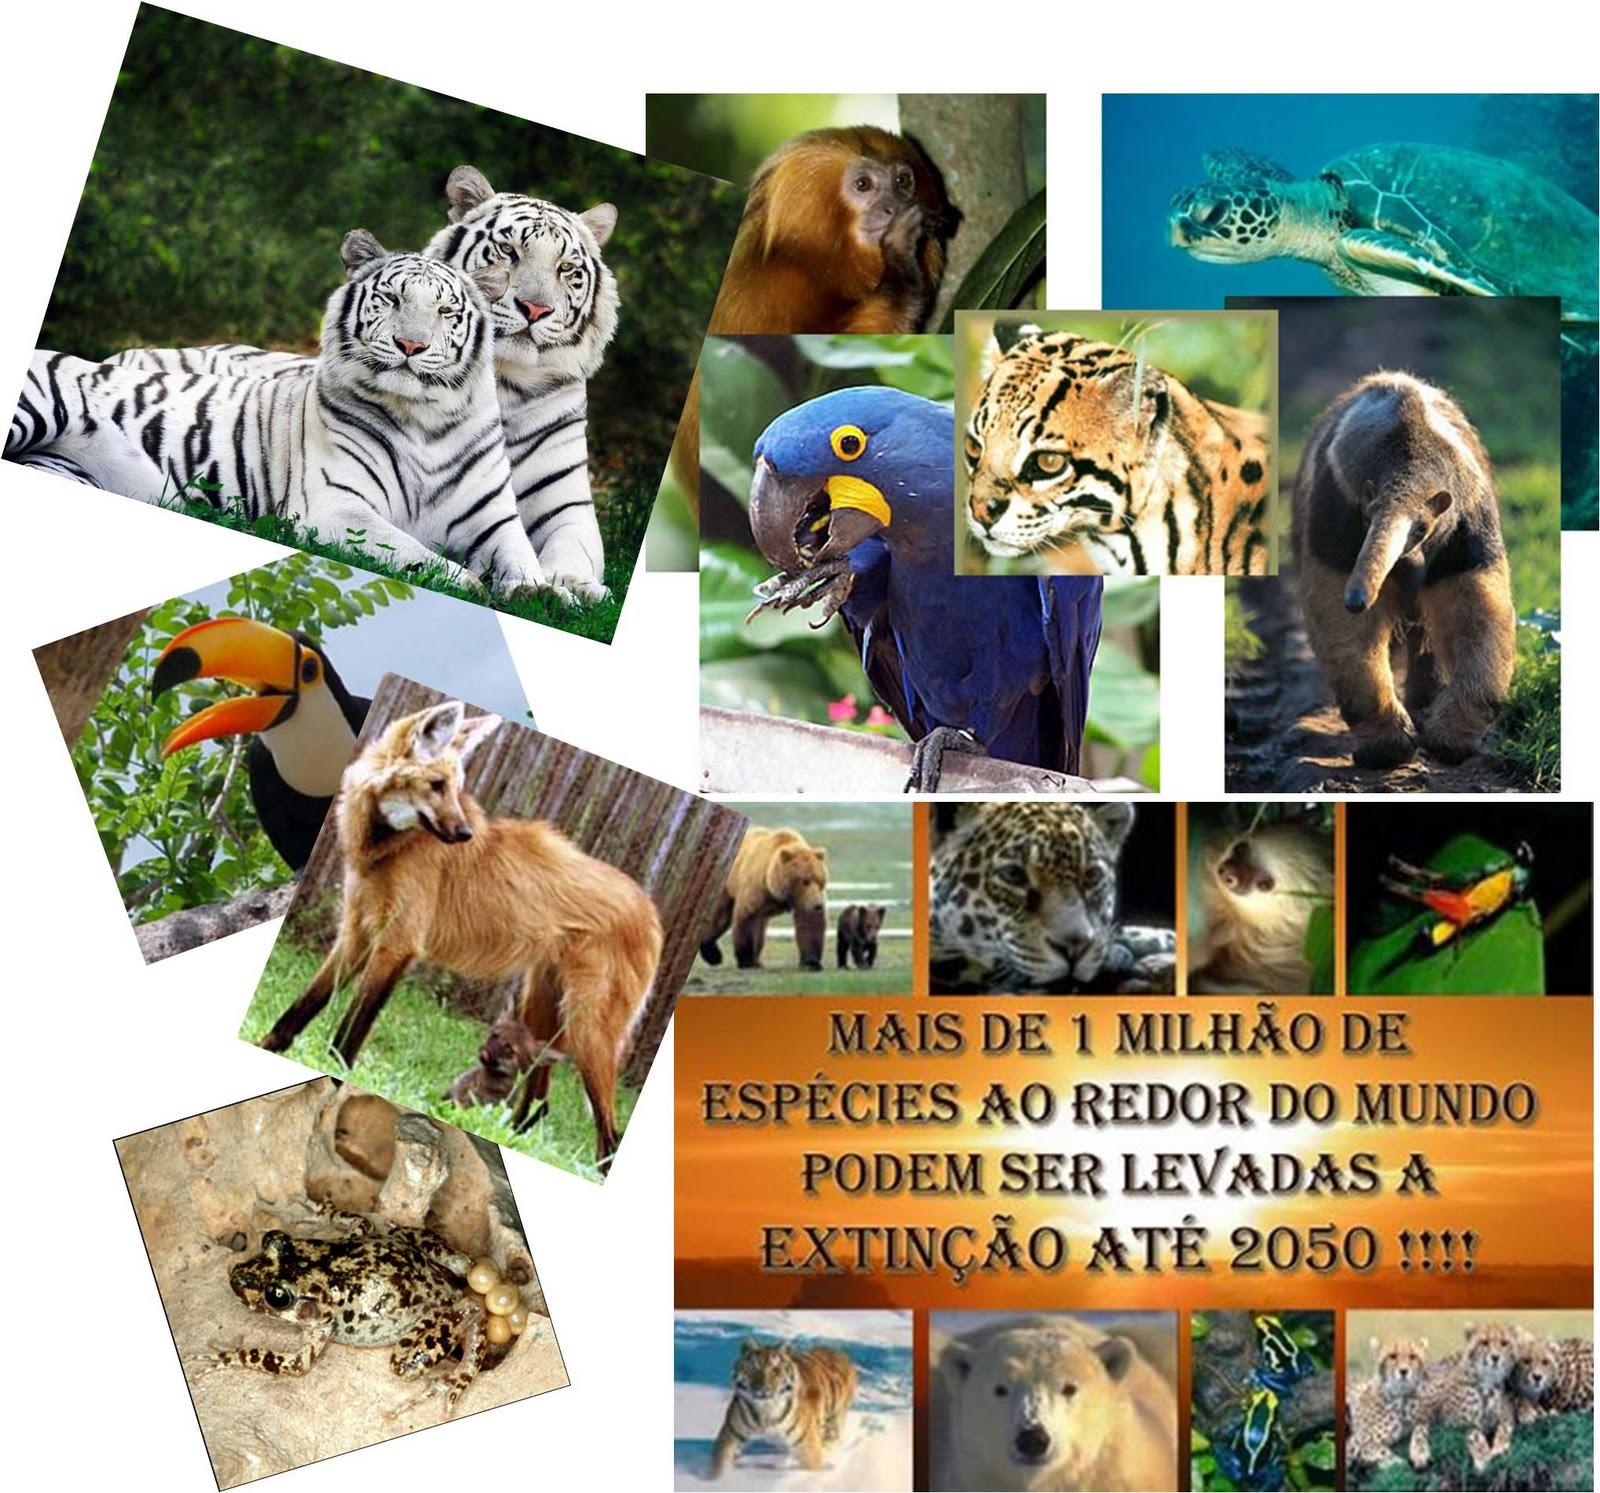 http://3.bp.blogspot.com/-Q_KM008flvo/TrWx5cWgRyI/AAAAAAAAABw/AKyLFYl1Kvo/s1600/animais+em+extincao.jpg